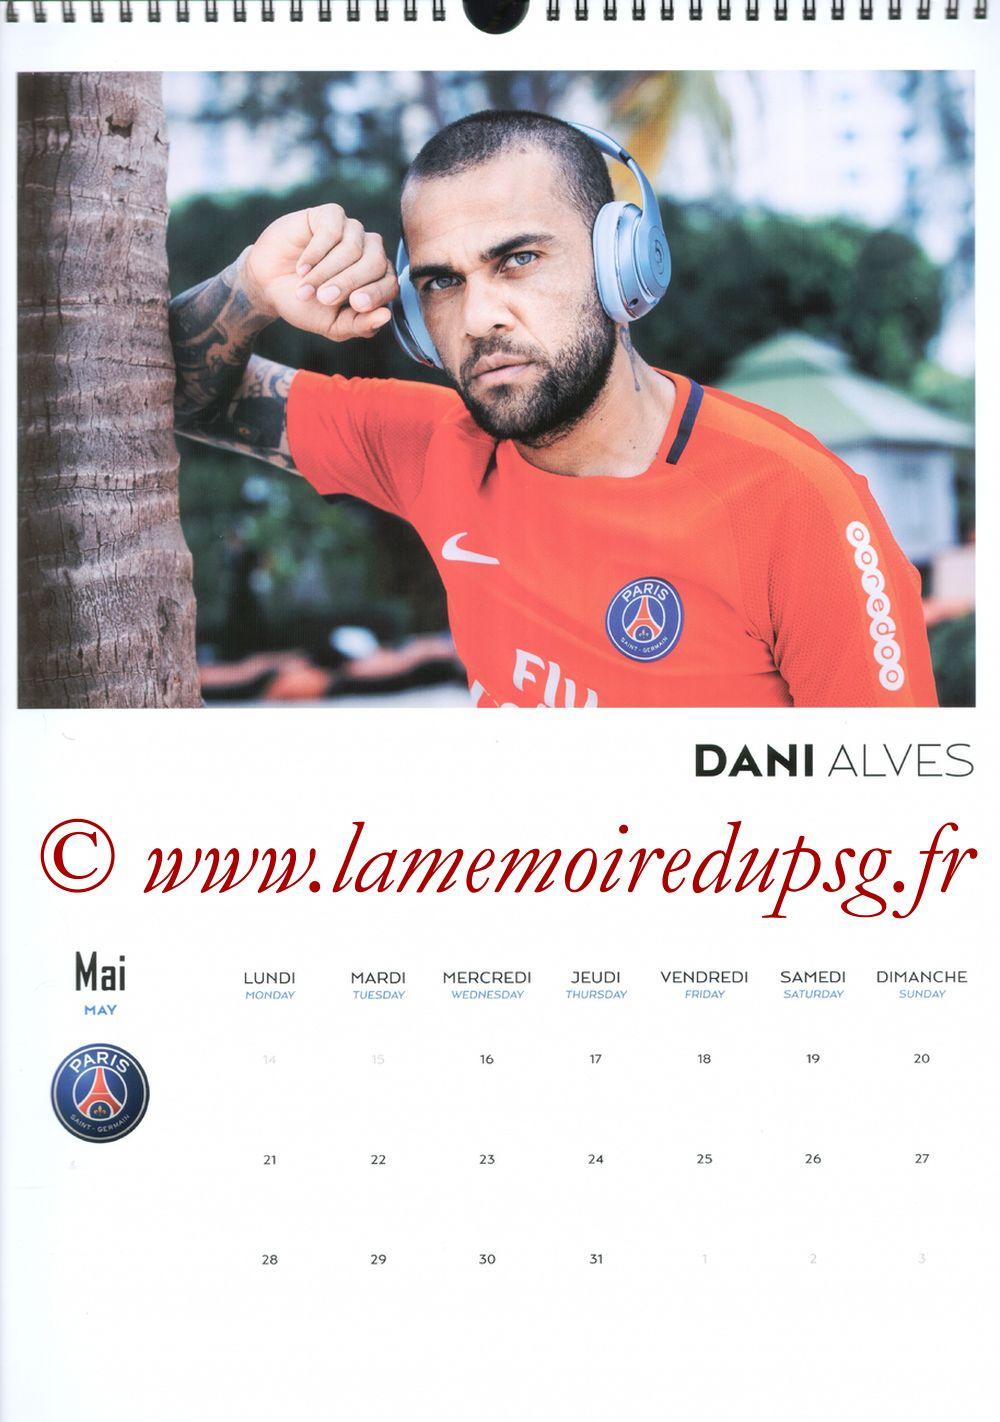 Calendrier PSG 2018 - Page 10 - Dani ALVES